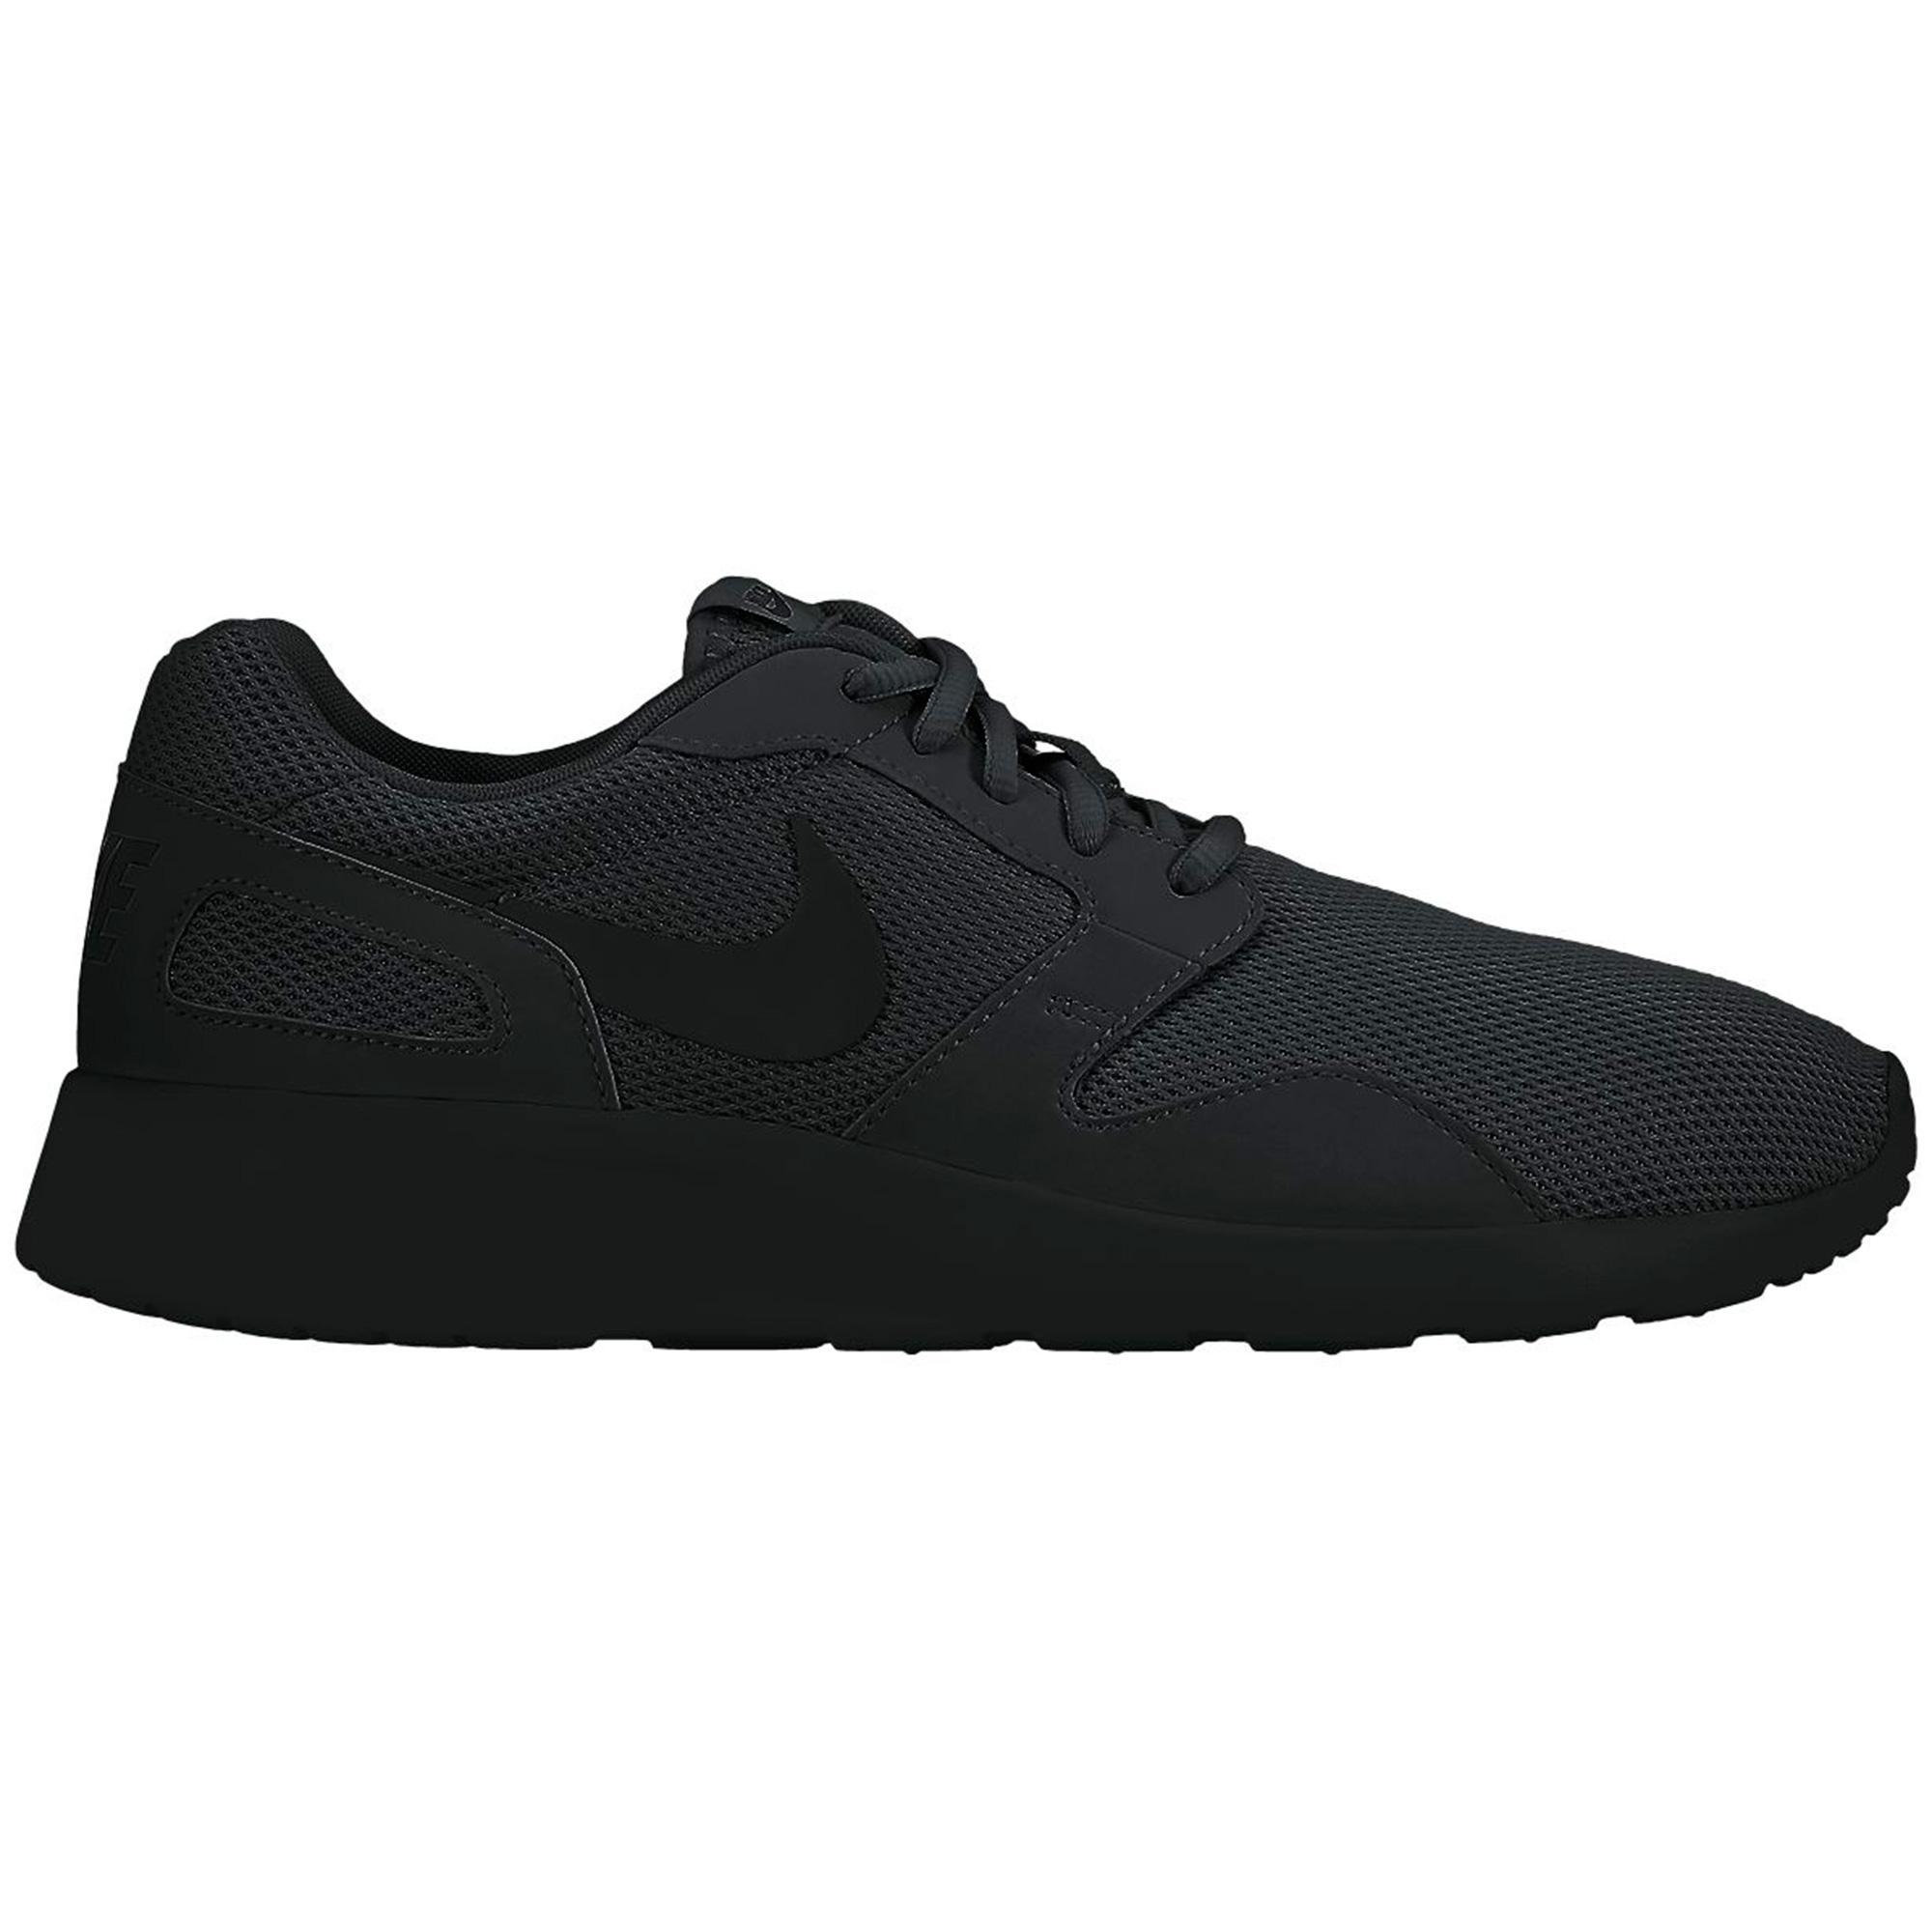 Nike Mens Kaishi Running Shoes - Black - Tennisnuts.com